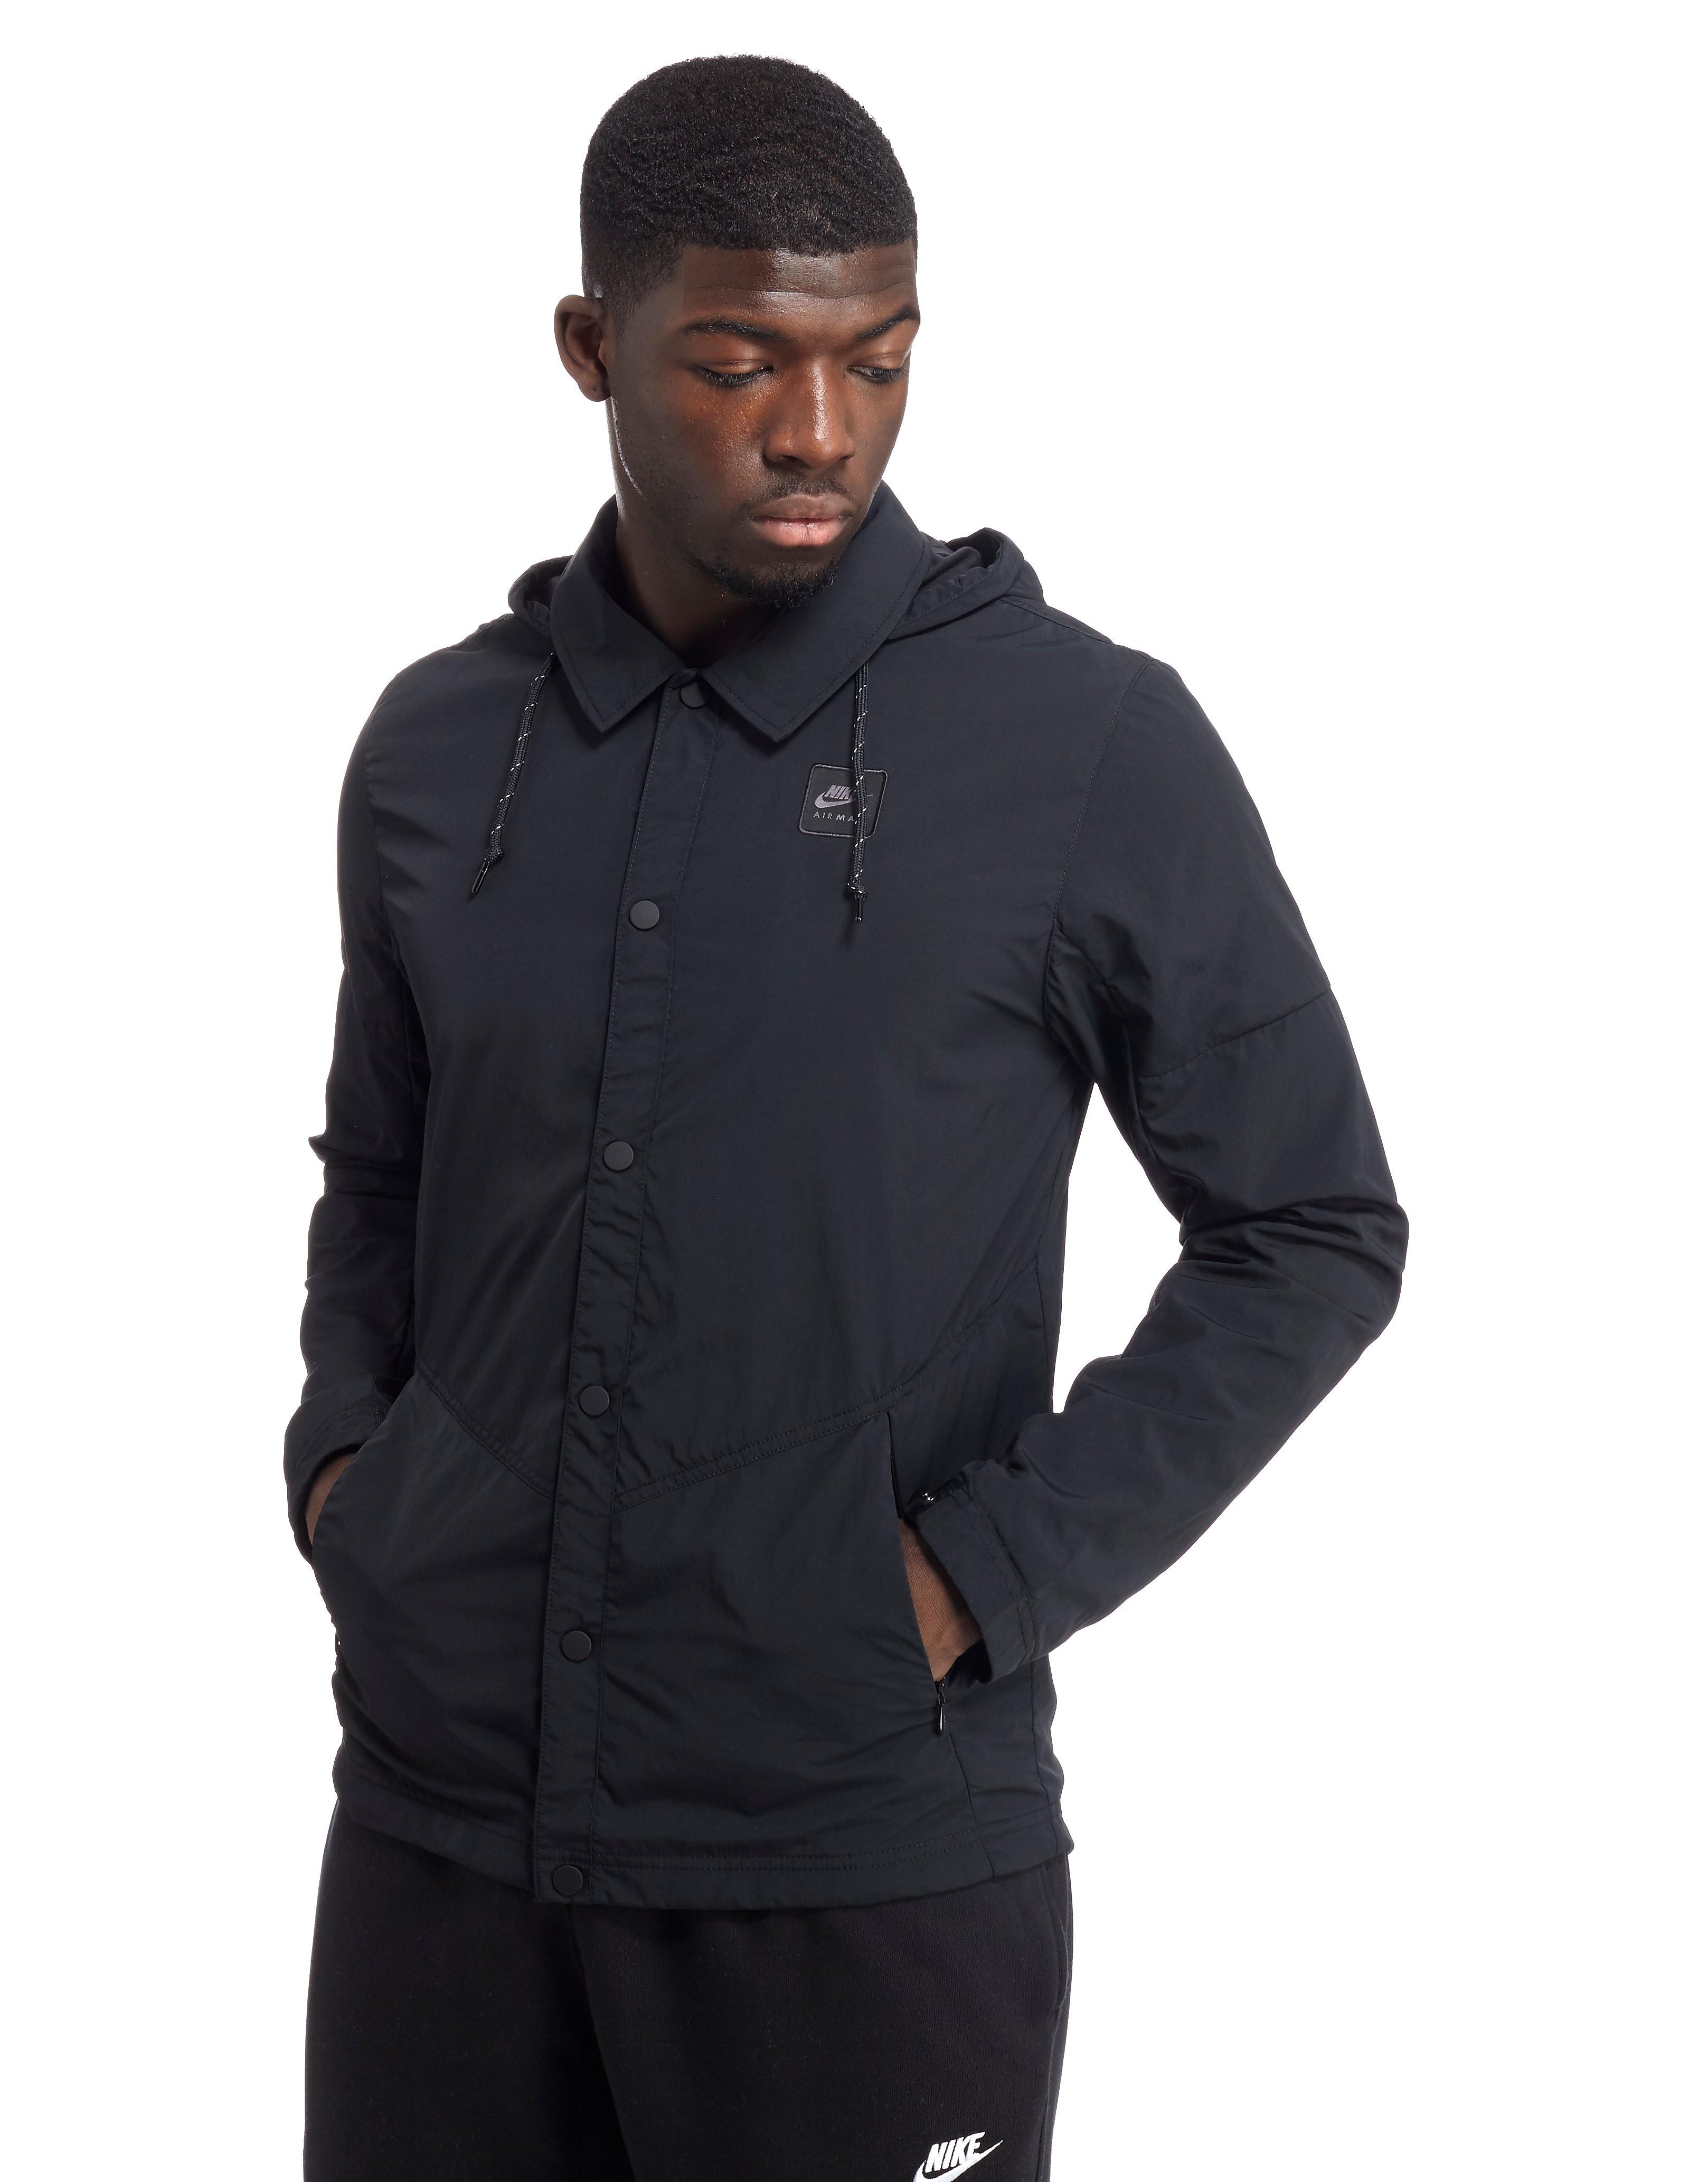 nike air max woven jacket black mens sports king store. Black Bedroom Furniture Sets. Home Design Ideas